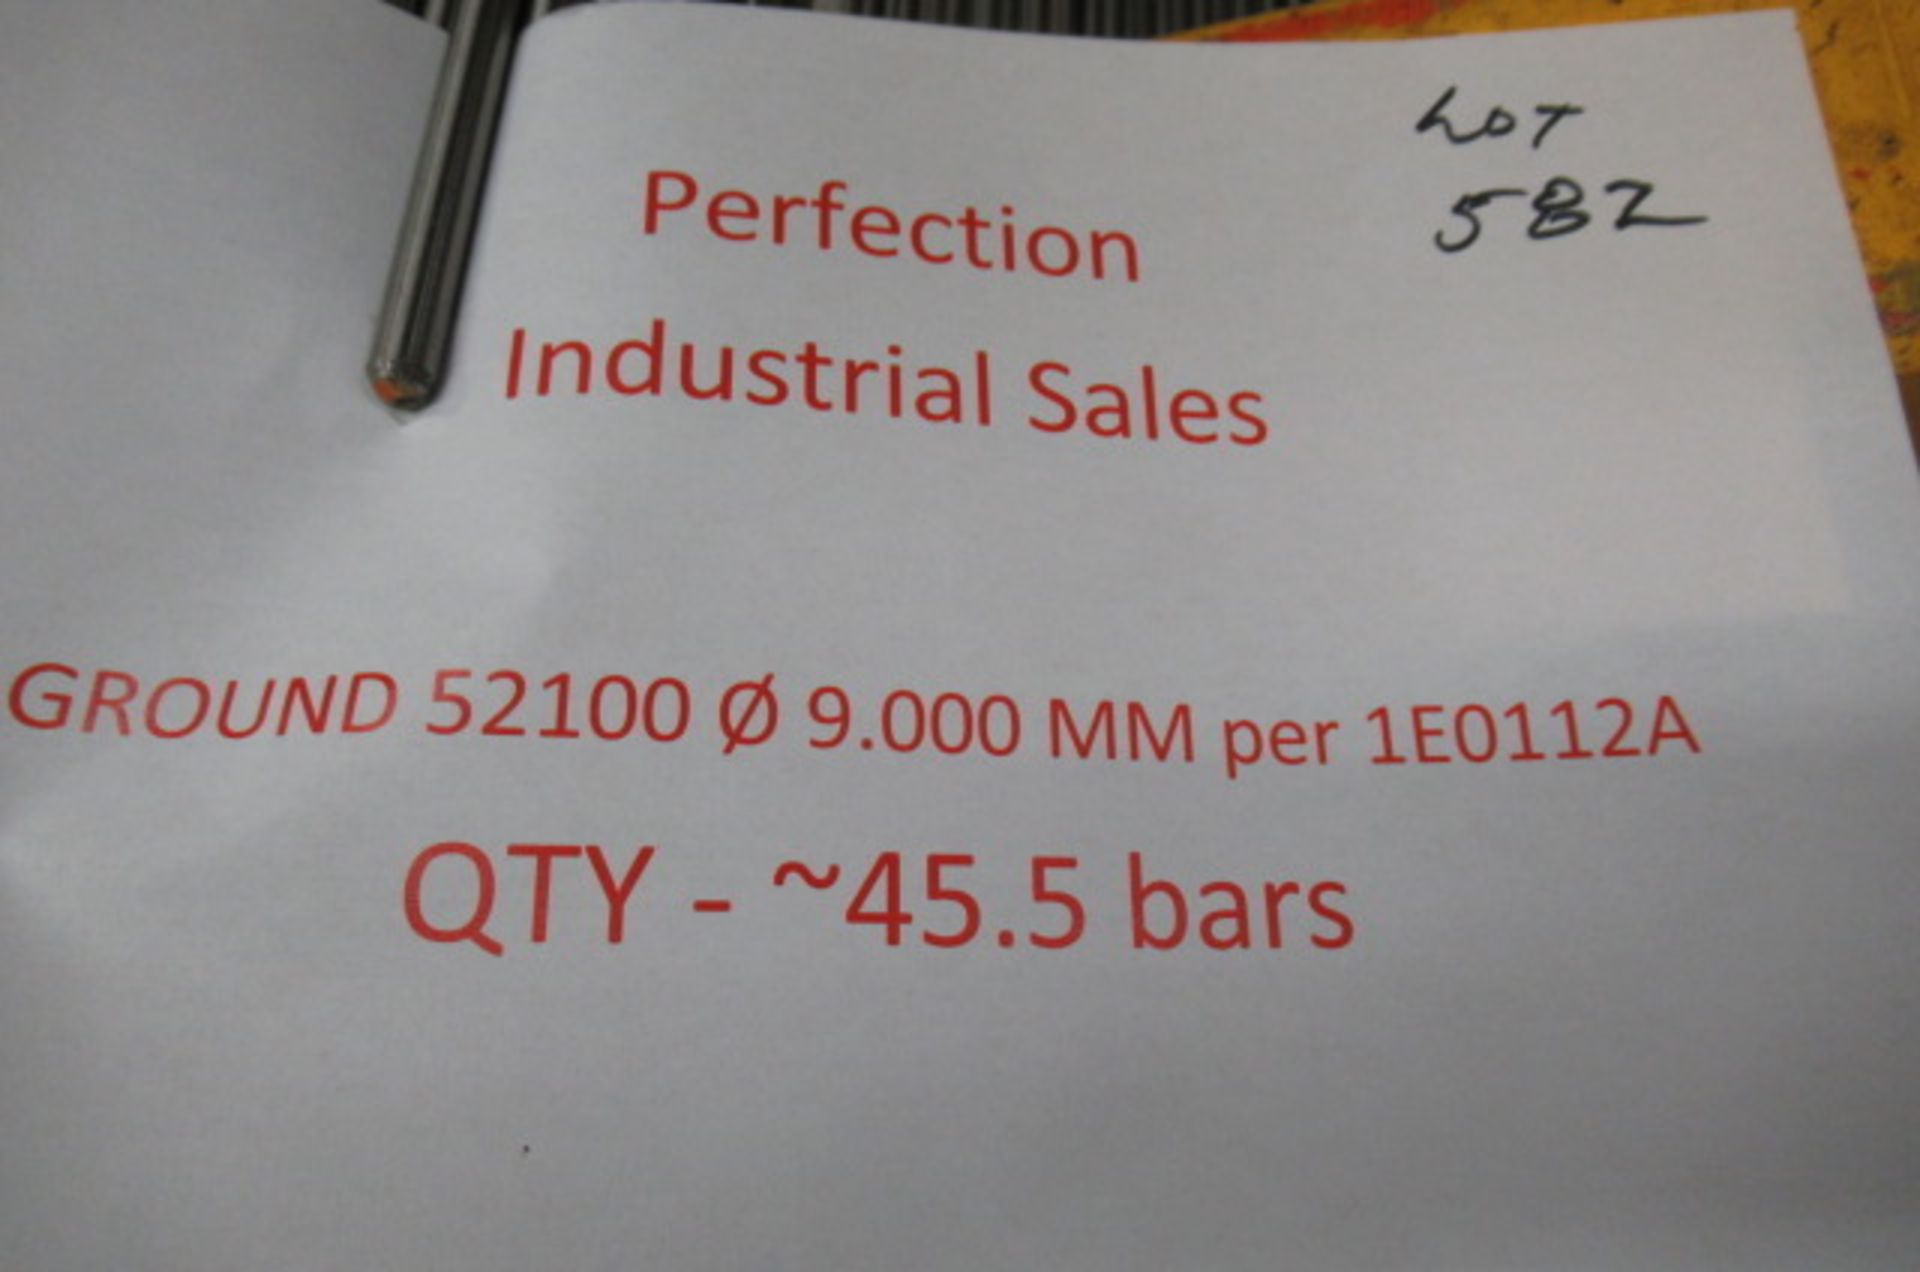 Lot steel round stock 52100 09.000mm per 1E0112A qty 45